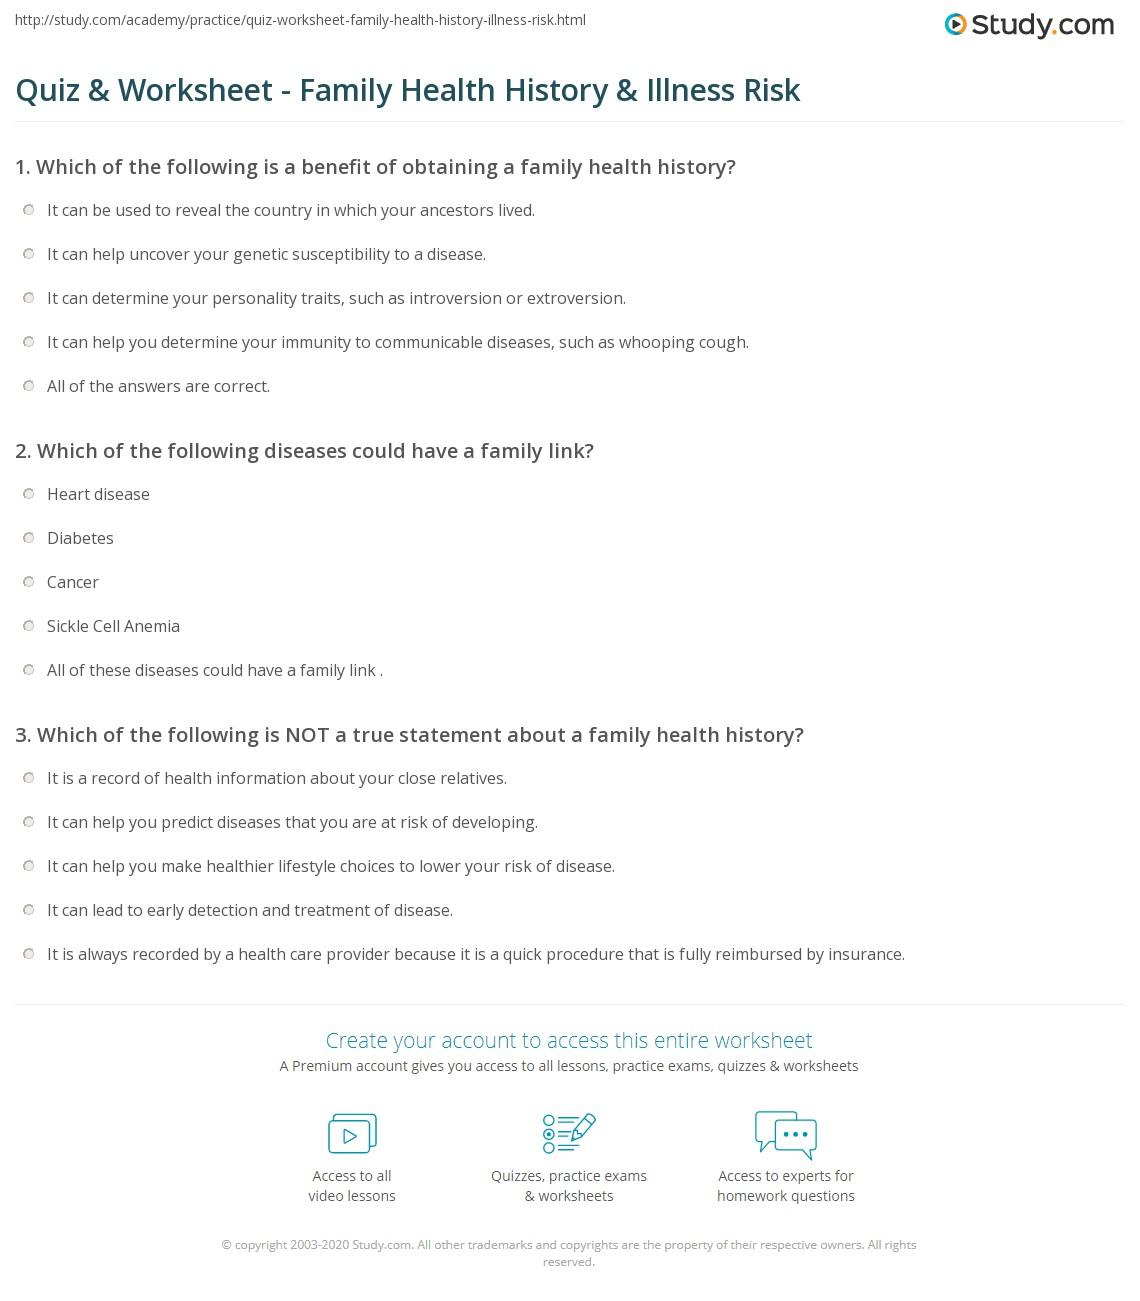 Quiz & Worksheet - Family Health History & Illness Risk